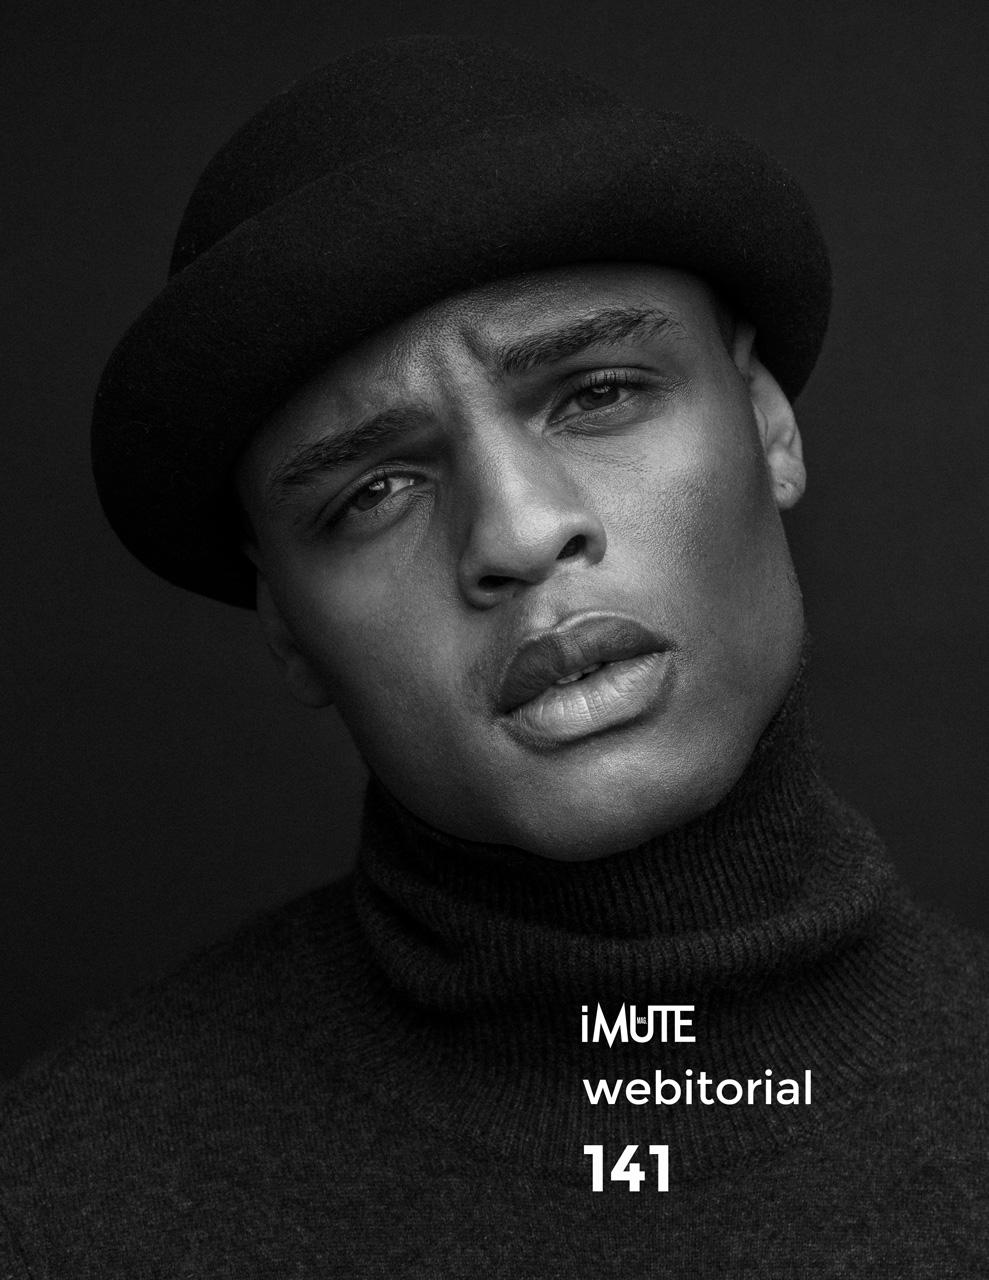 Isaiah webitorial for iMute Magazine Photographer Jeff Rojas Model  Isaiah Hamilton @UModelsNYC Stylist Mike Stallings